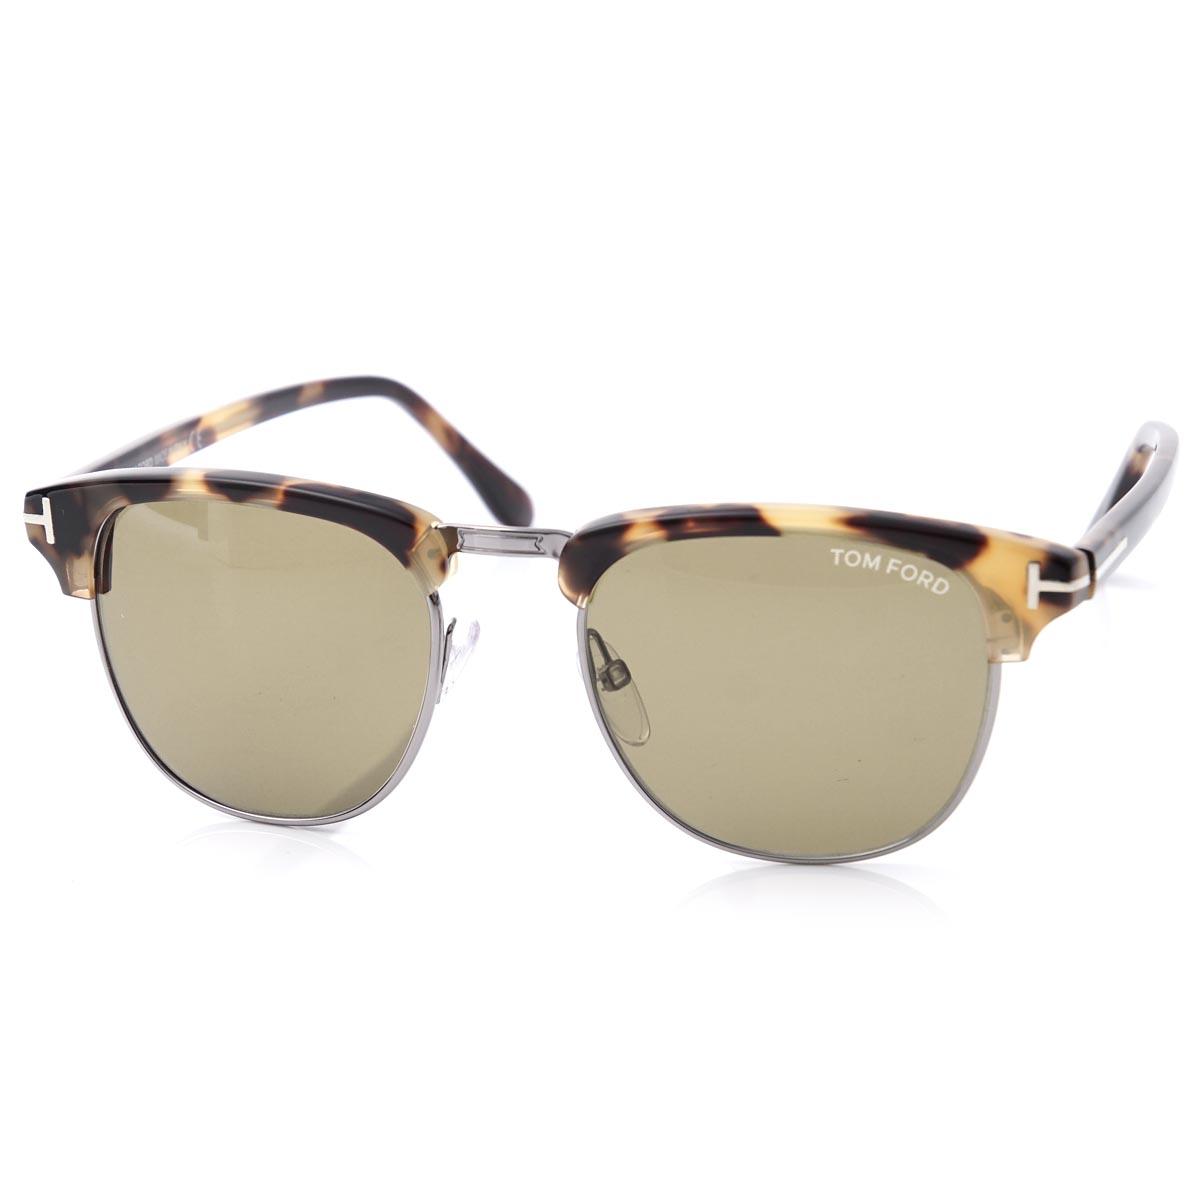 0f179fe510 Modern Blue Rakuten Ichiba Shop  Tom Ford TOM FORD sunglasses beige ...